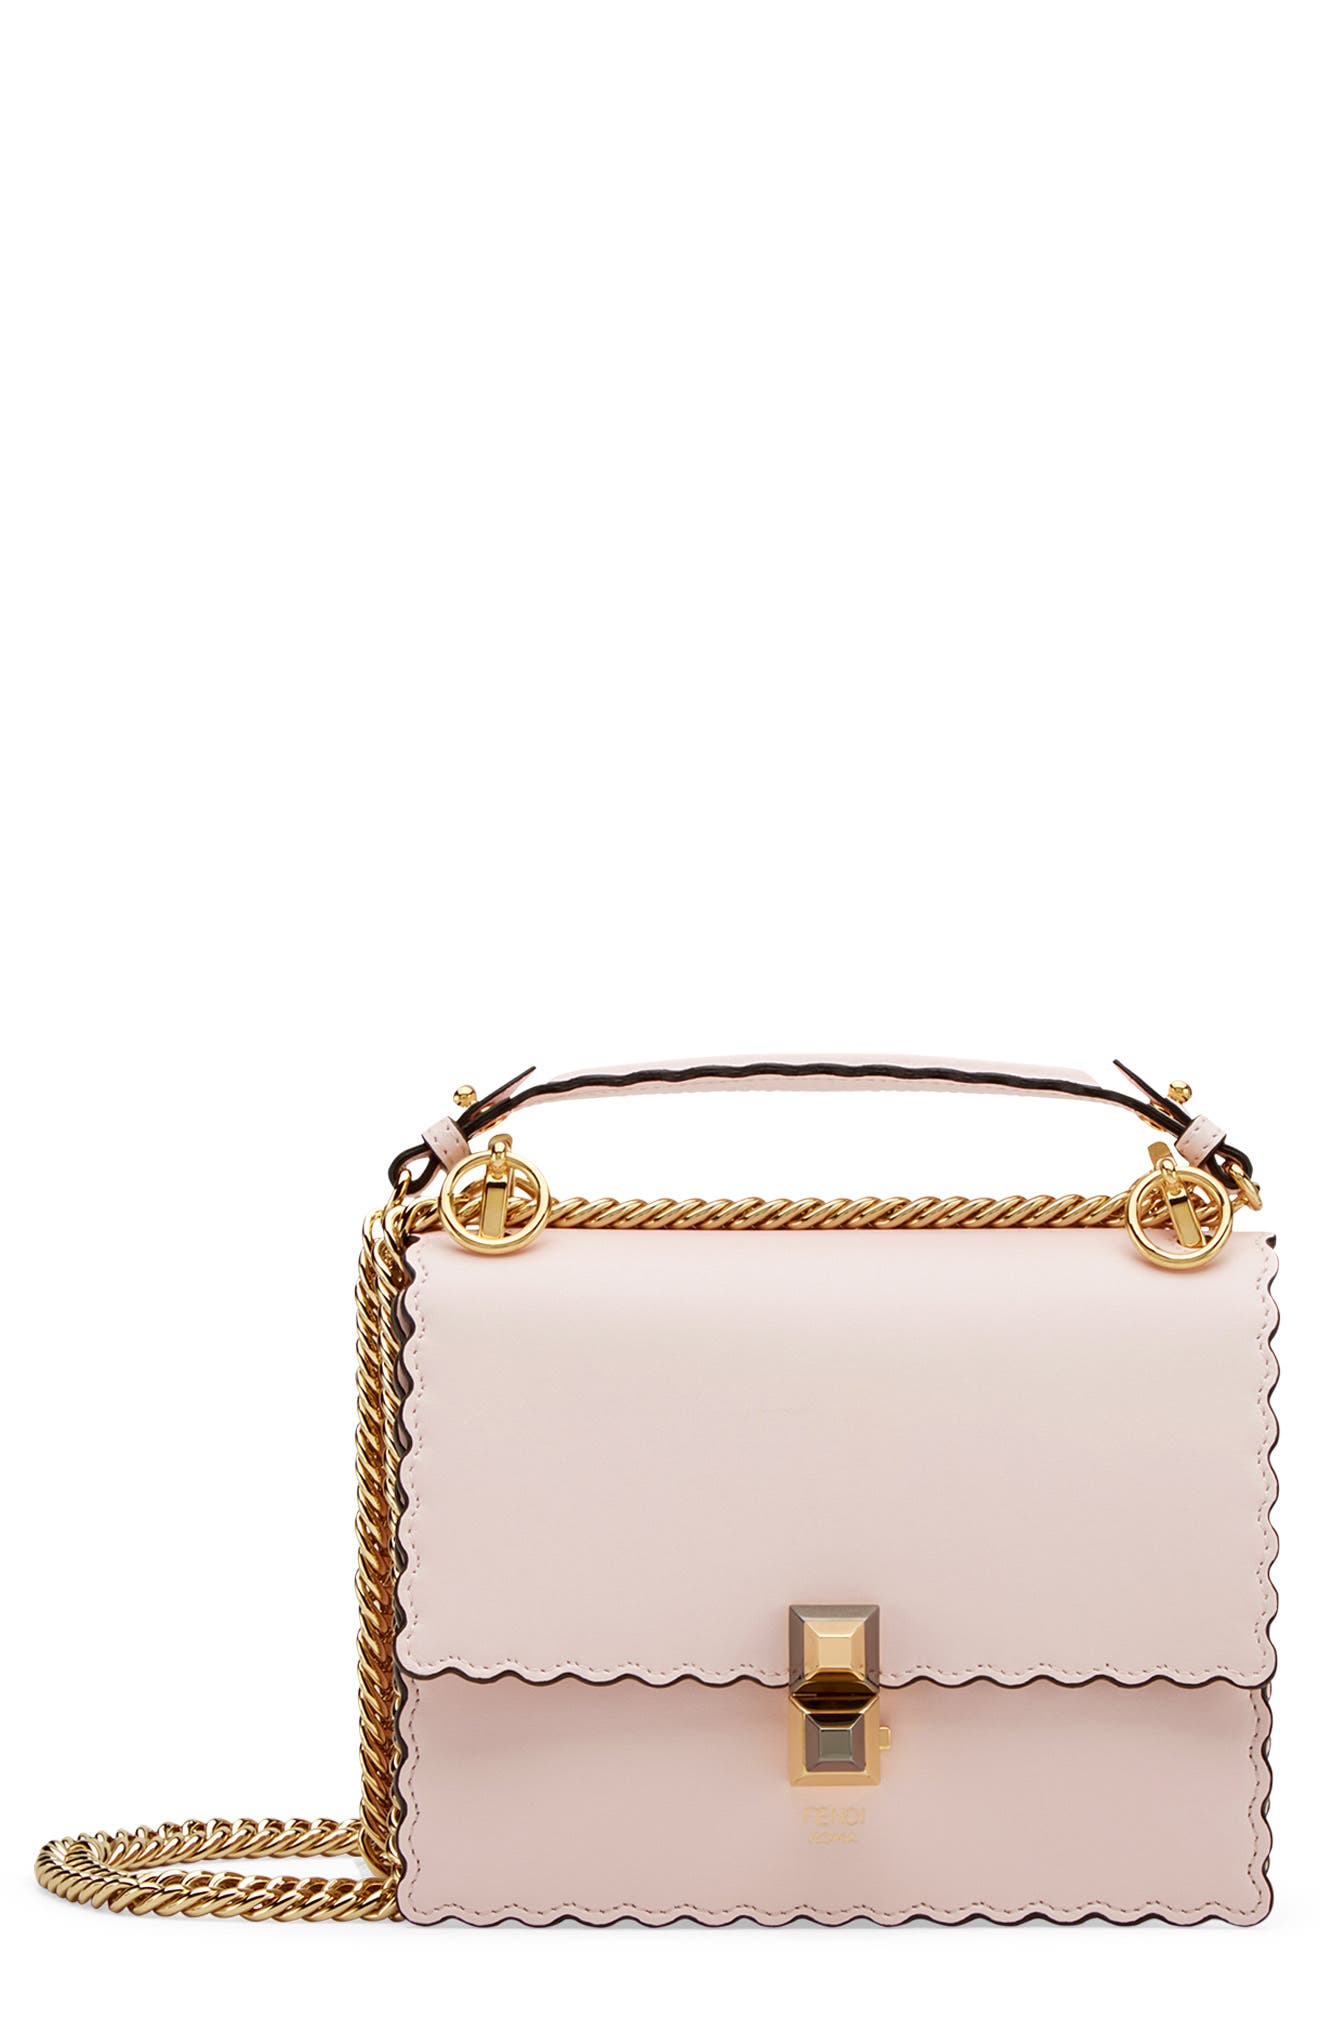 Mini Kan I Scalloped Leather Shoulder Bag, Main, color, CONFETTO/ ORO SOFT